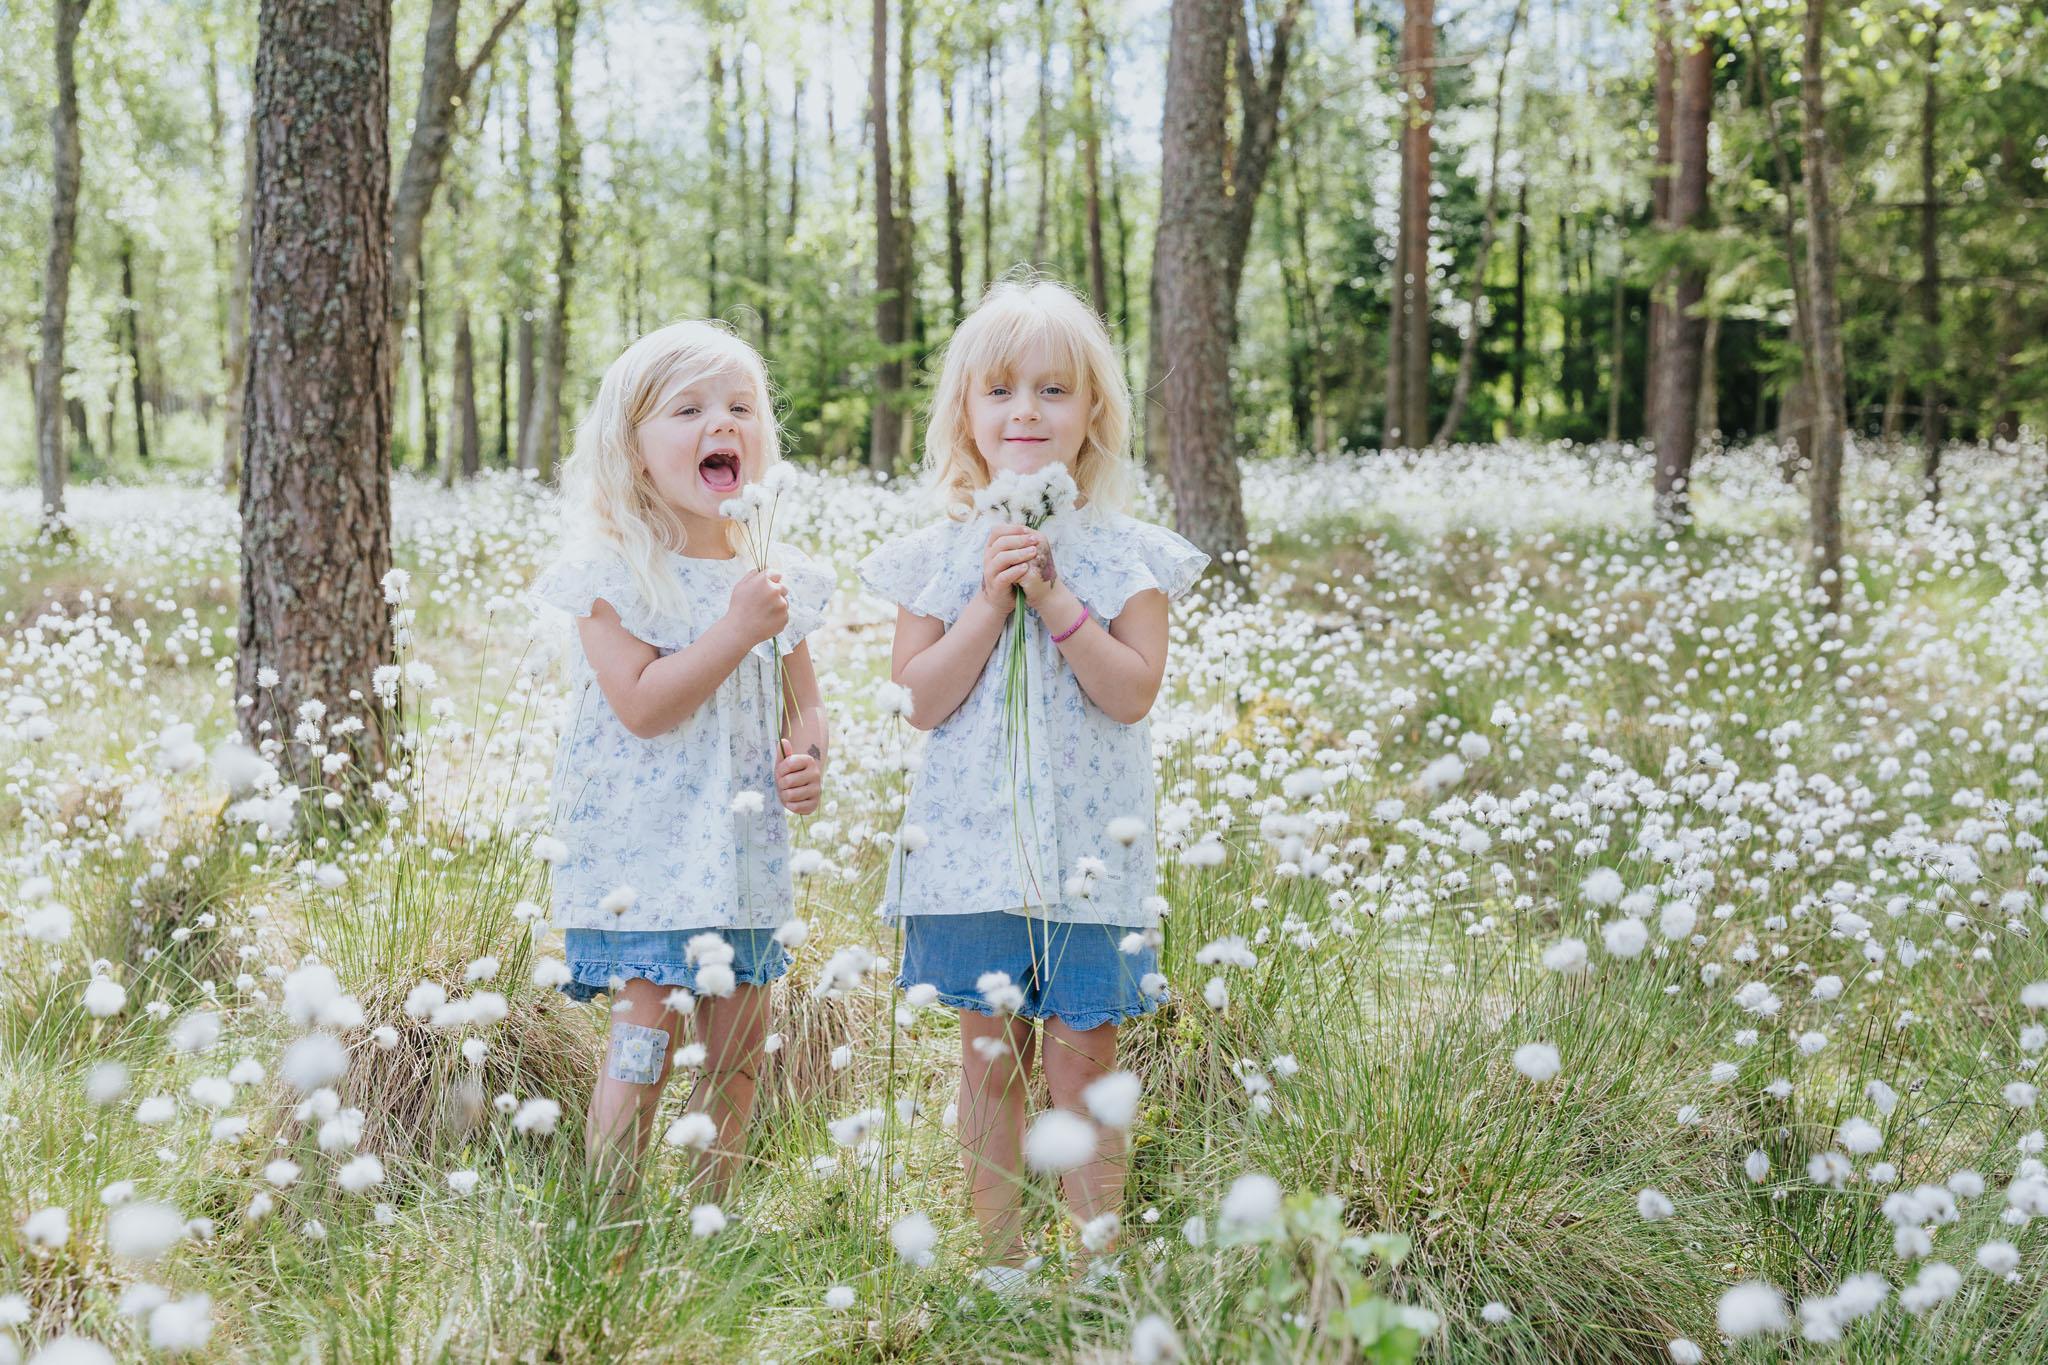 2018 05 20  Familjefotografering Almarsson, Fotograf Emy, 50.jpg